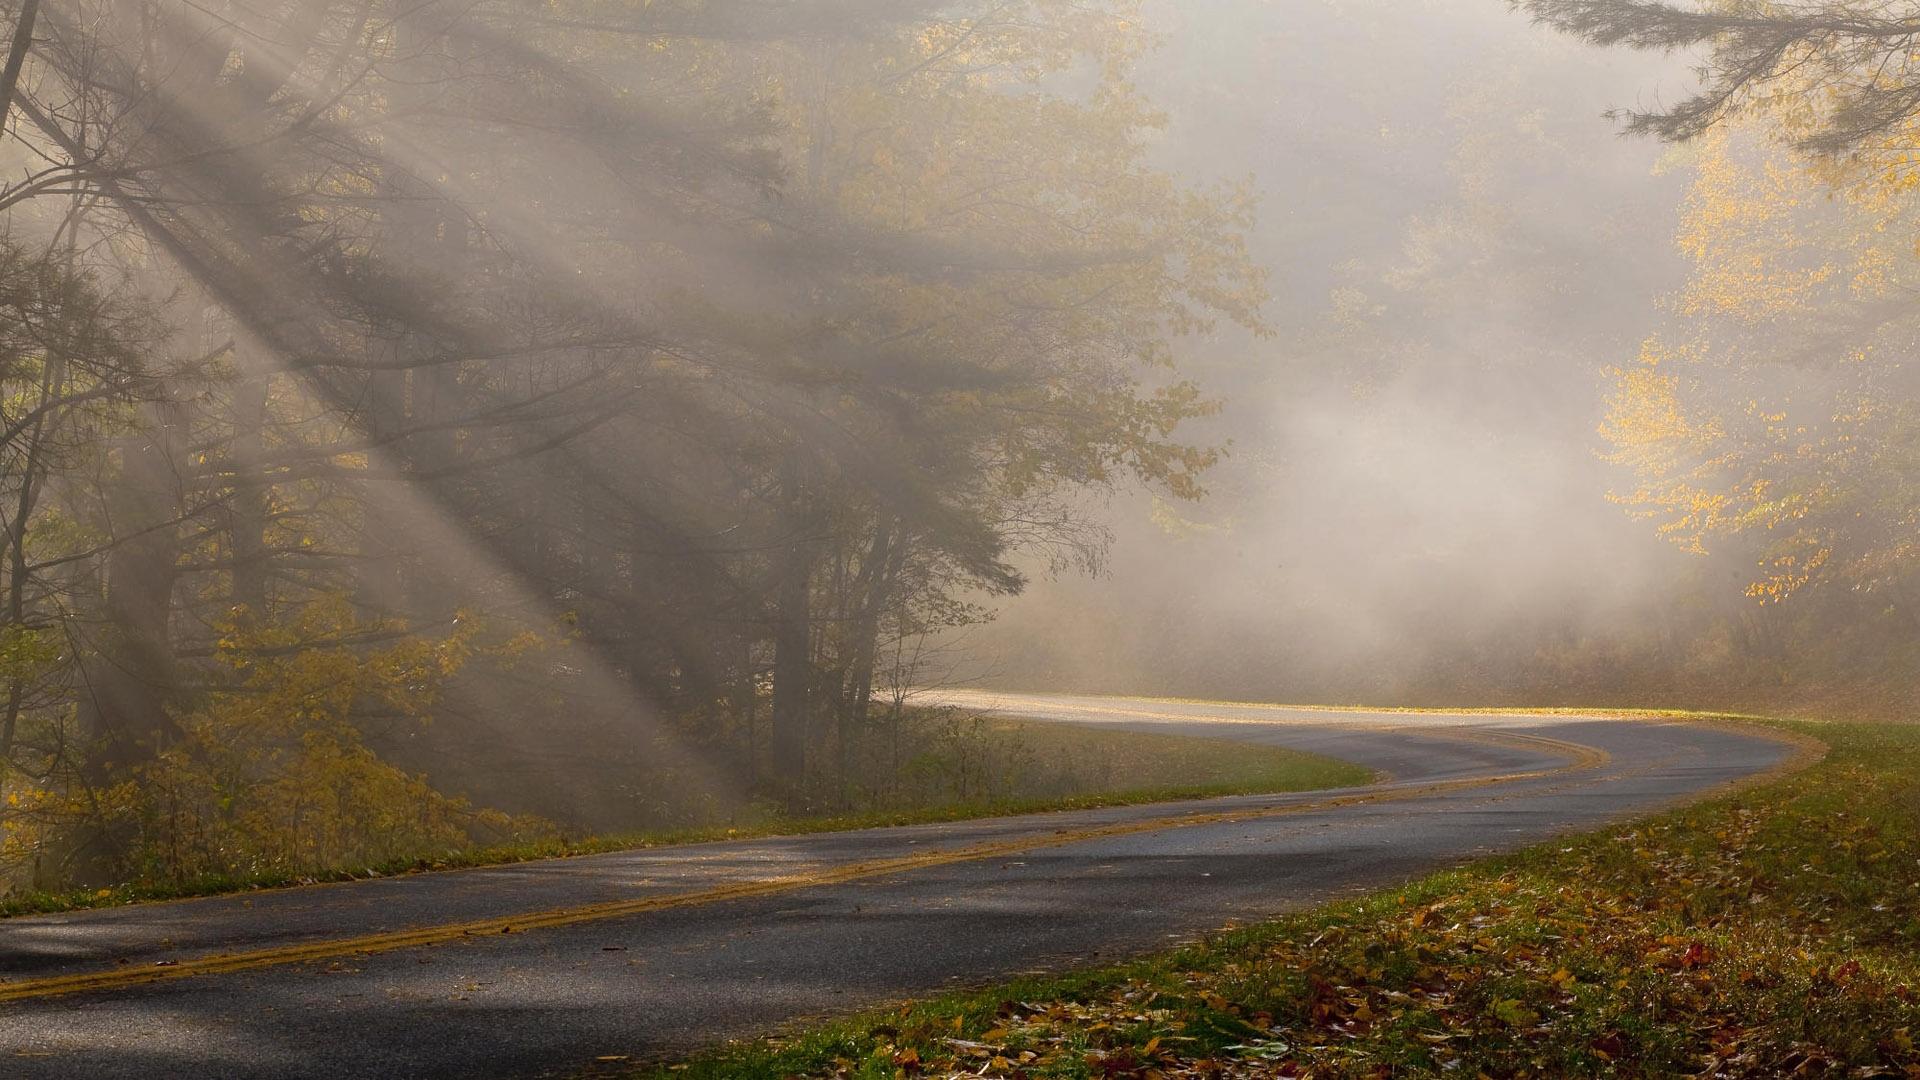 fog wallpapers - HD Desktop Wallpapers | 4k HD